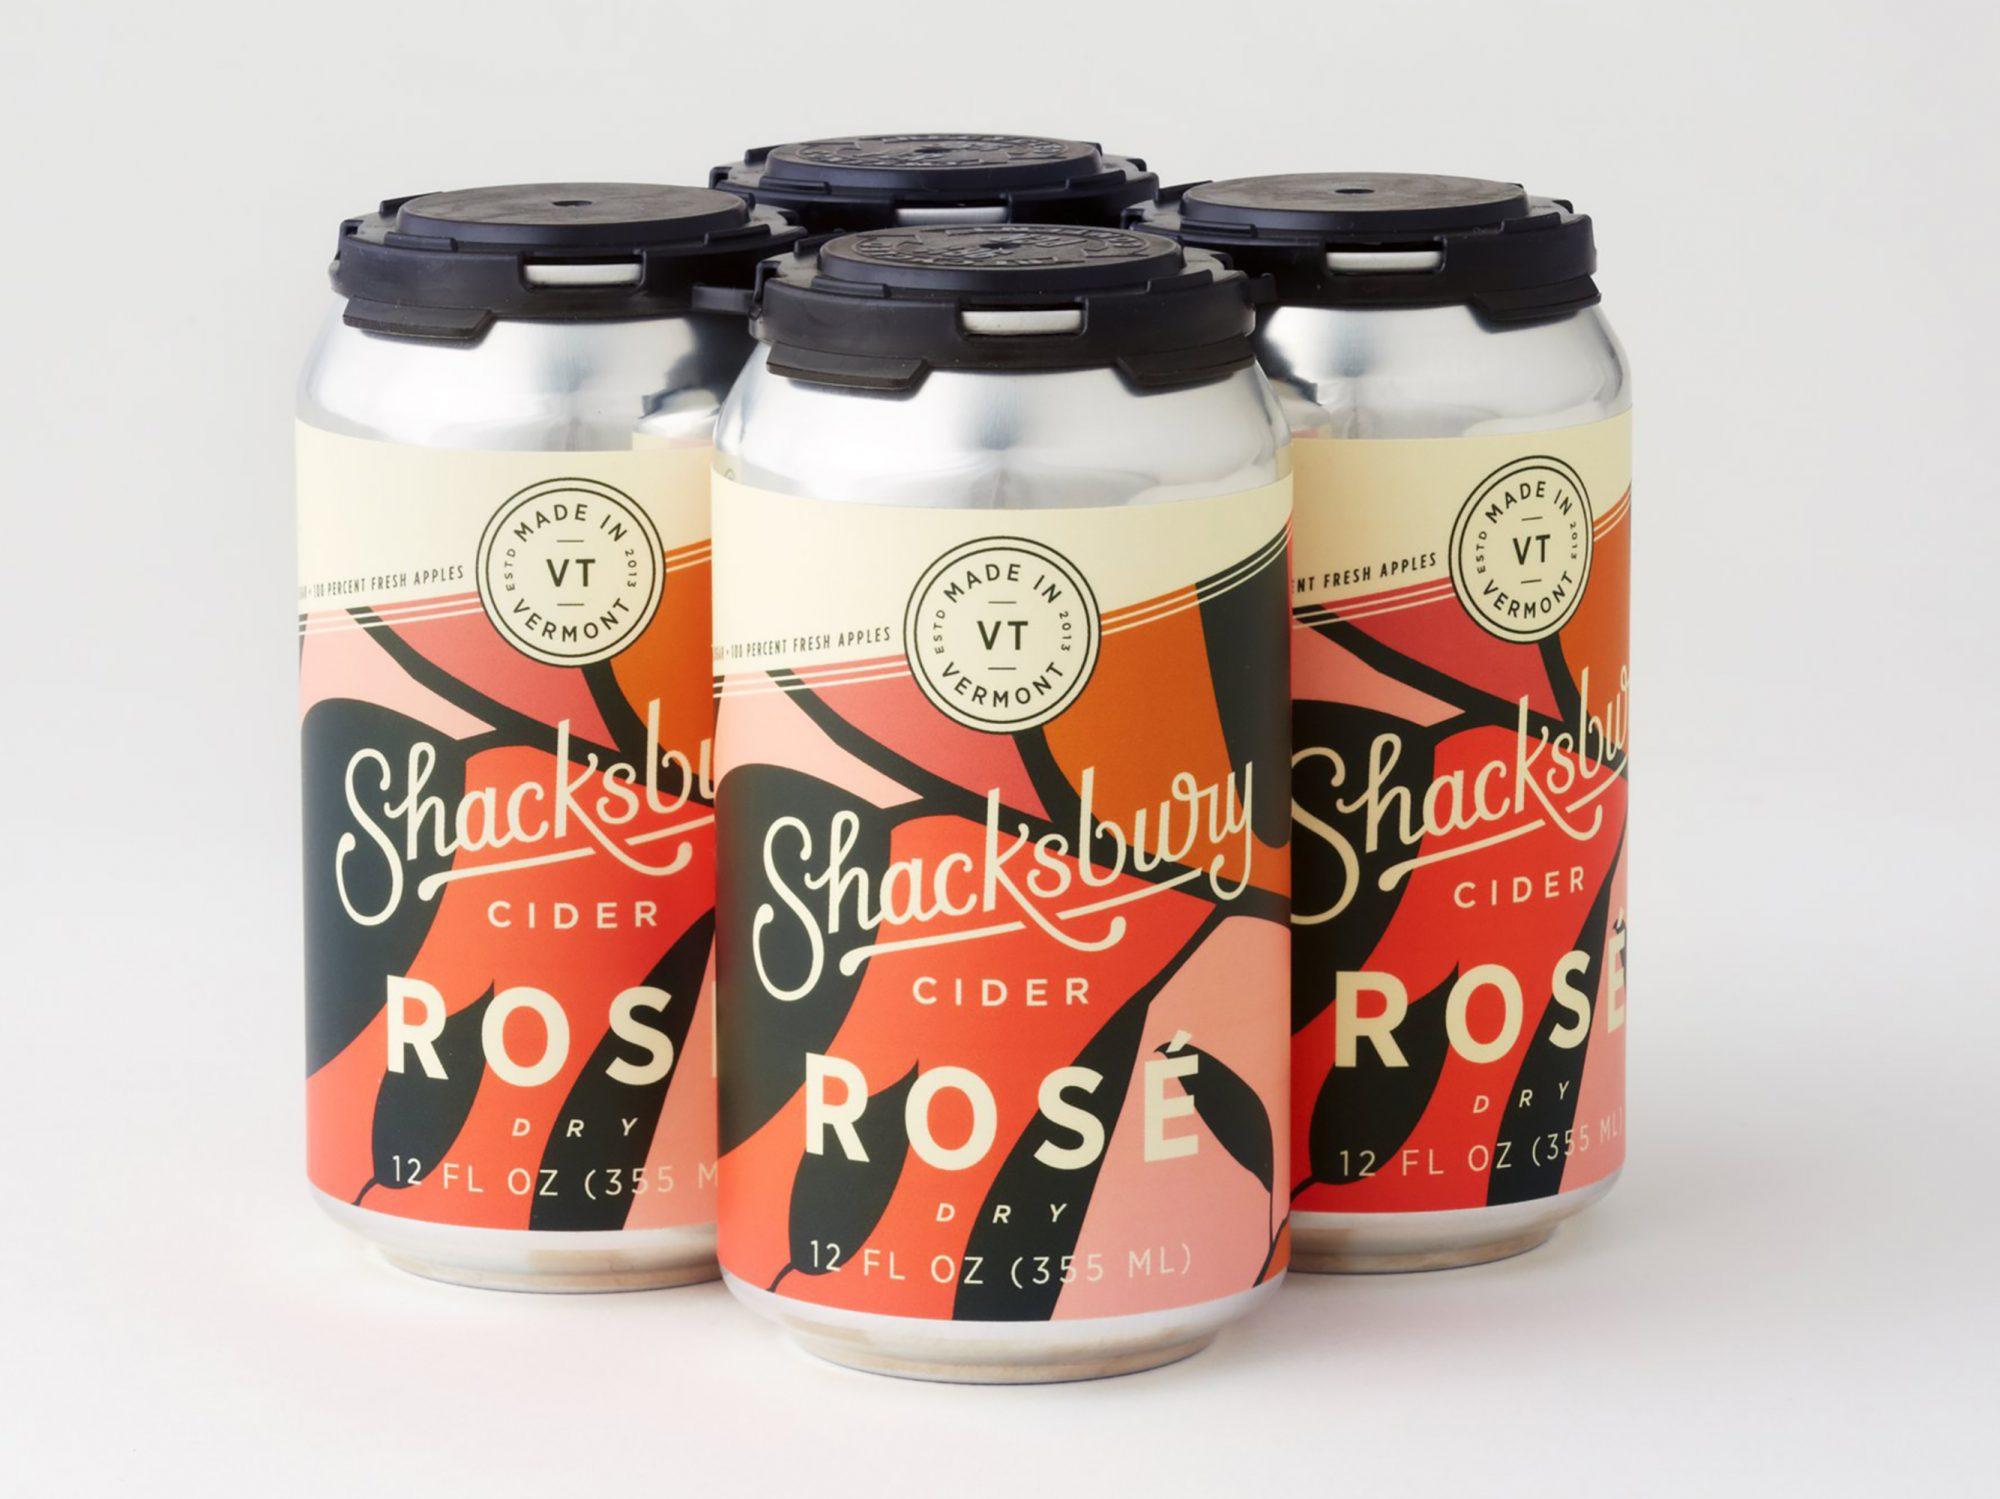 Shacksbury Dry Rosé Cider